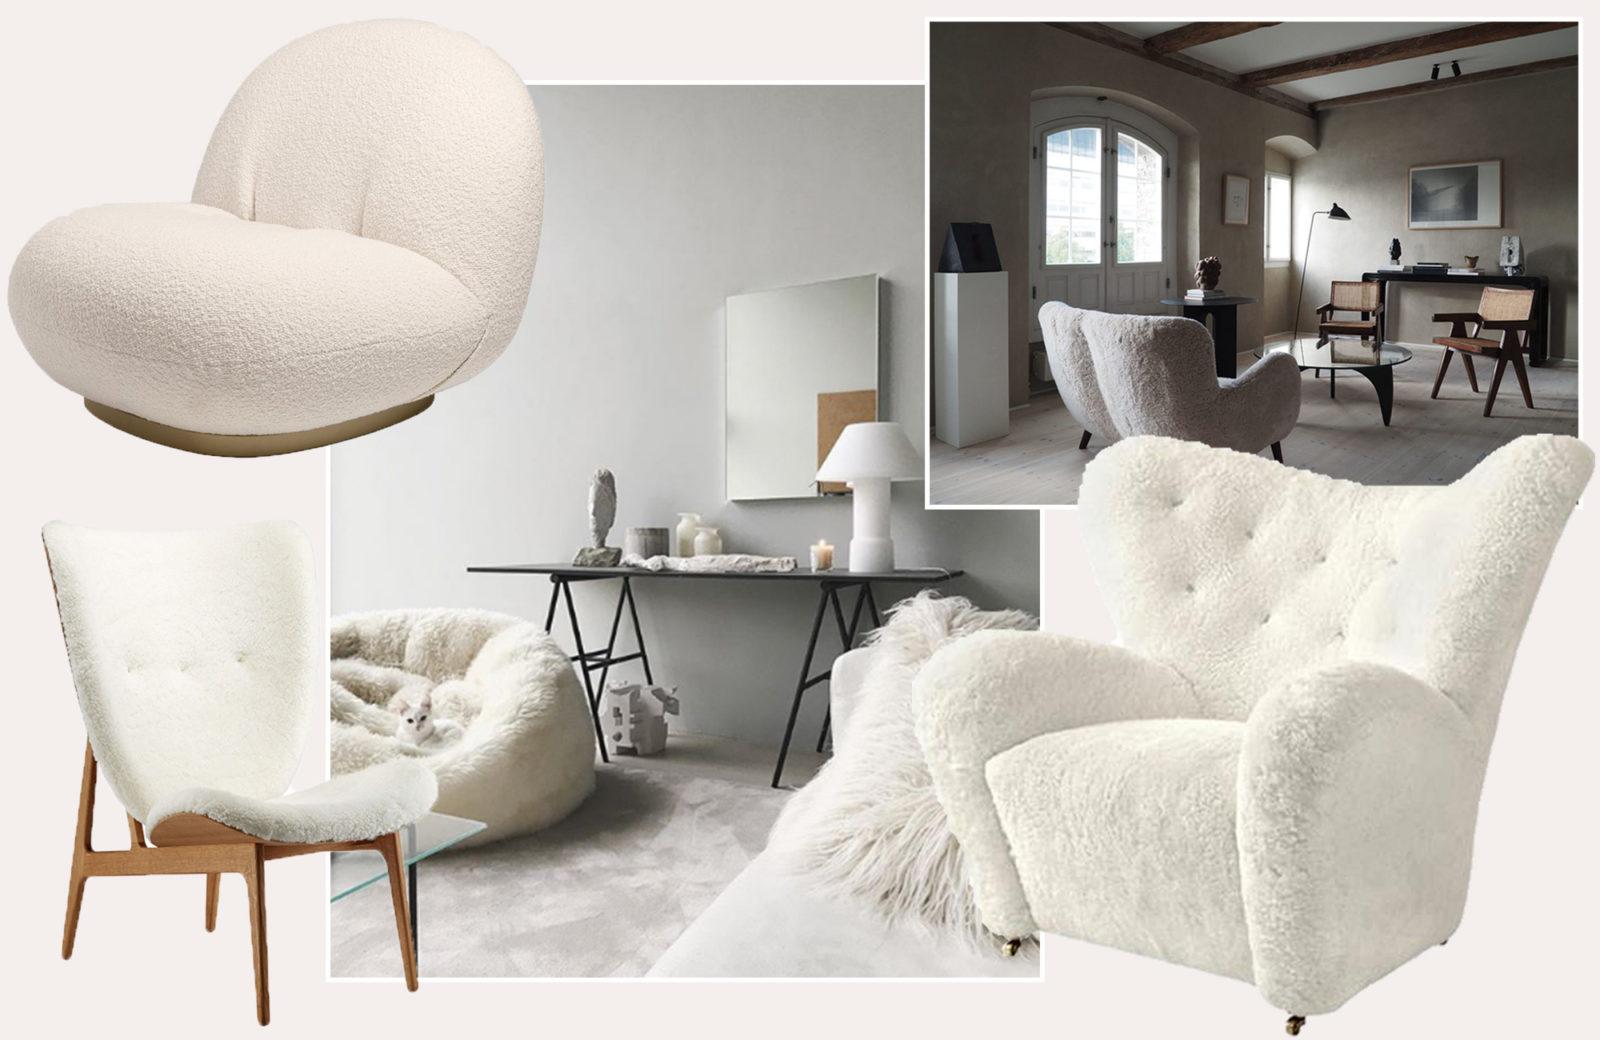 journelles-maison-interior-moebel-schafsfell - Journelles